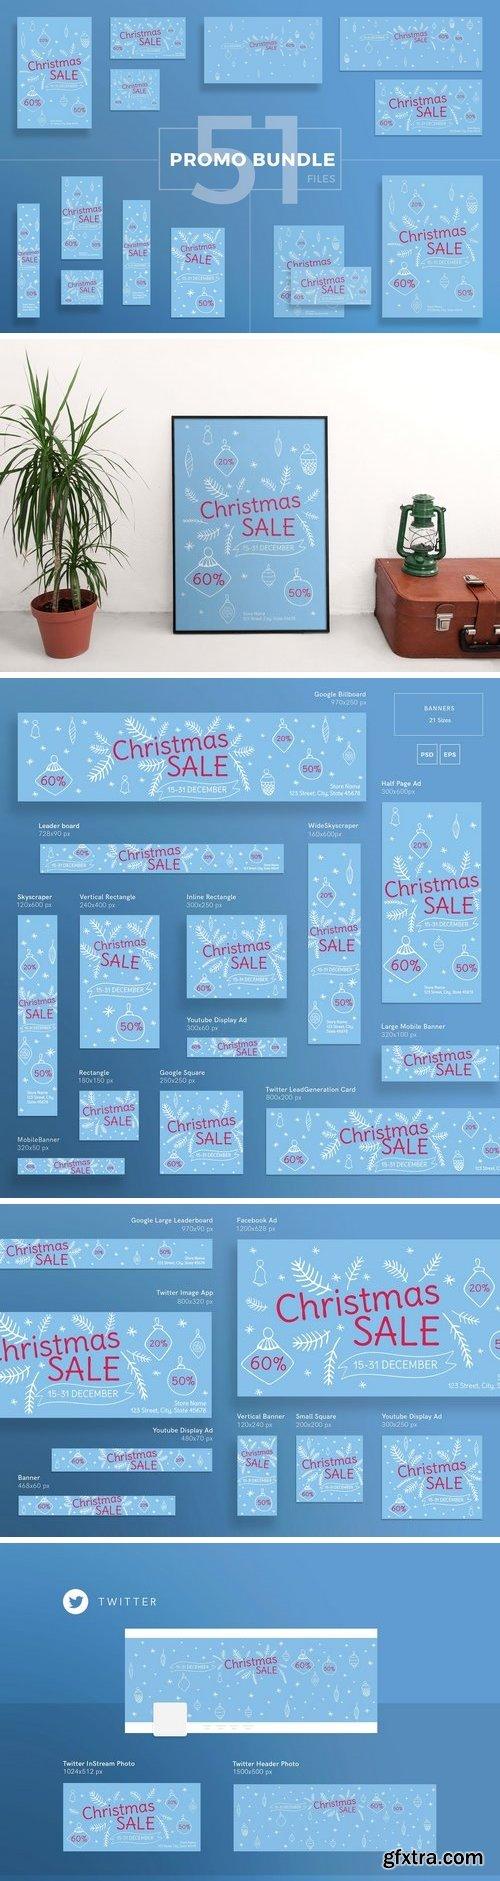 CM - Promo Bundle | Christmas Sale 2085535